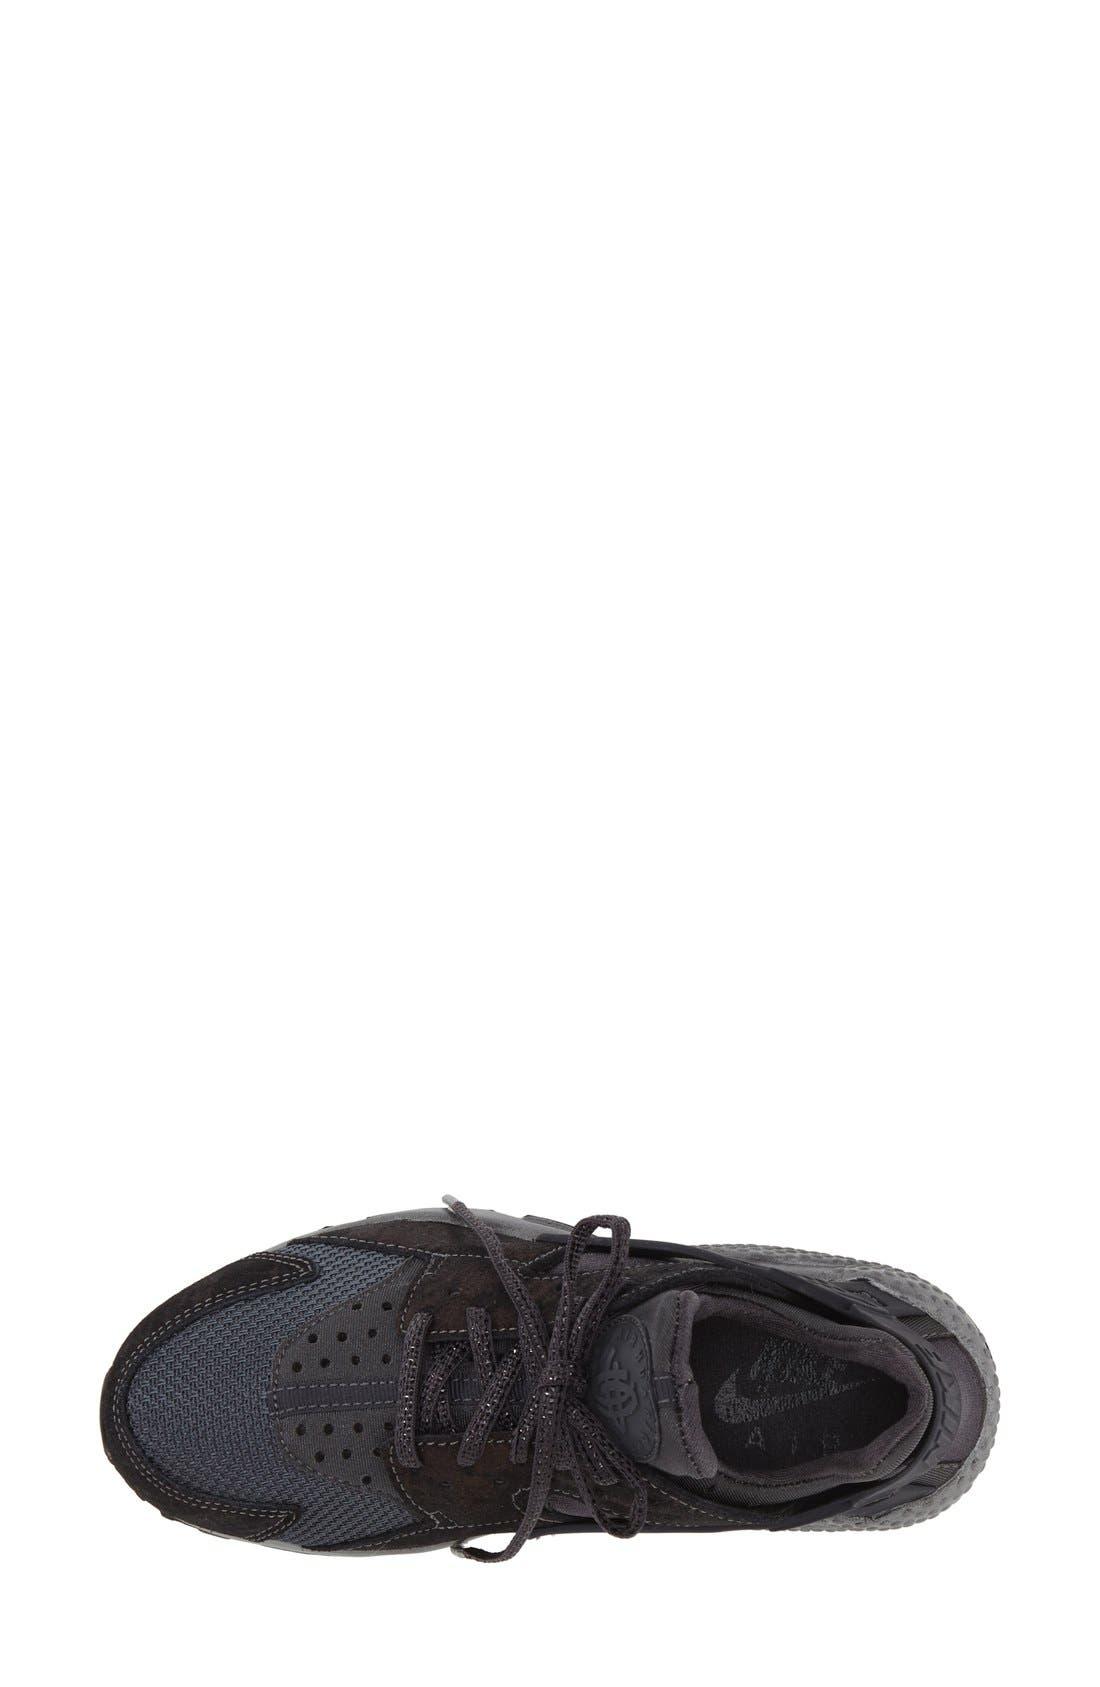 Alternate Image 3  - Nike 'Air Huarache' Sneaker (Women)